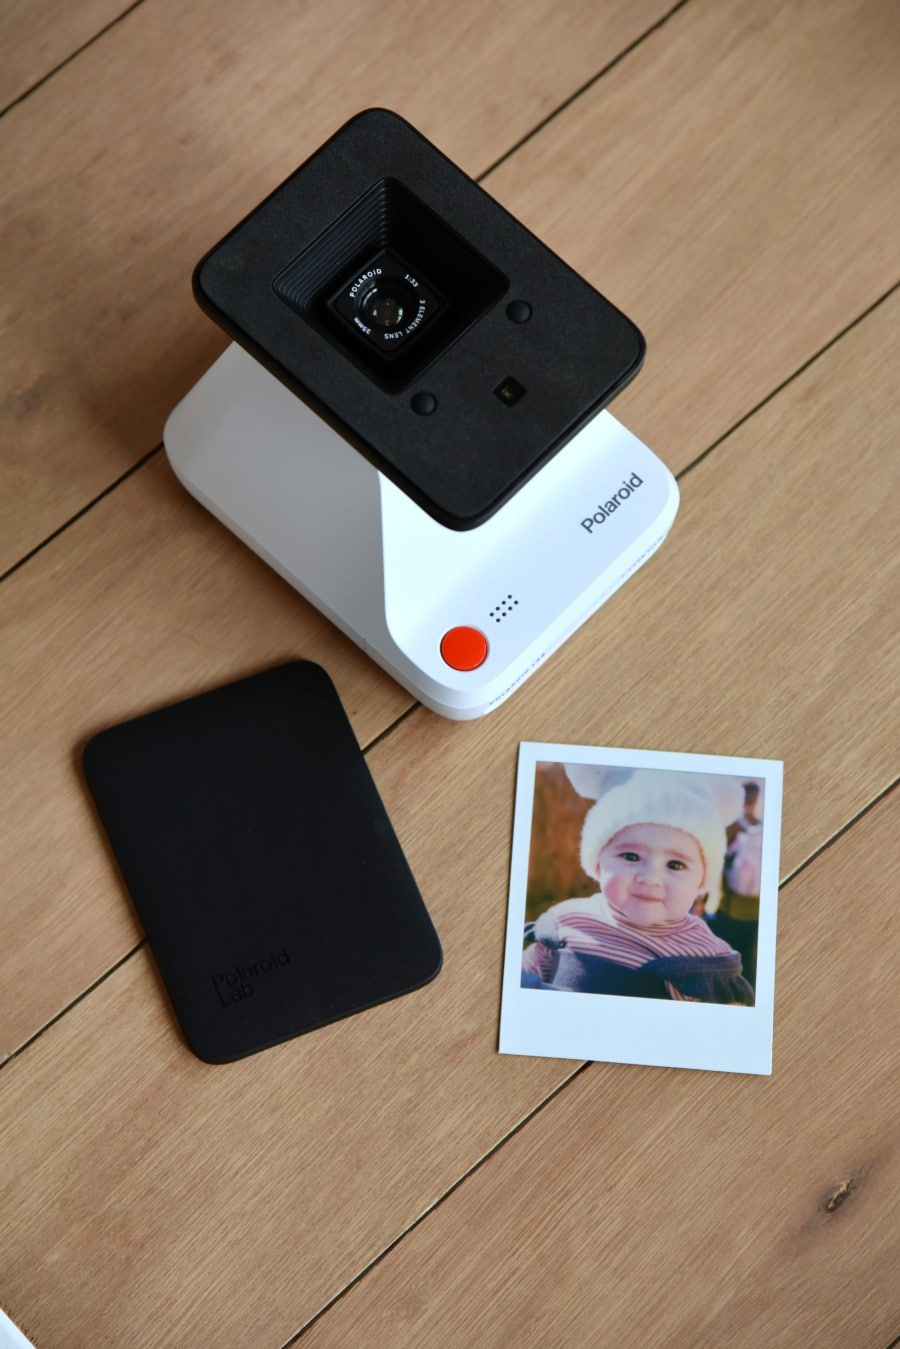 Print Your Smartphone Photos on Polaroid Lab